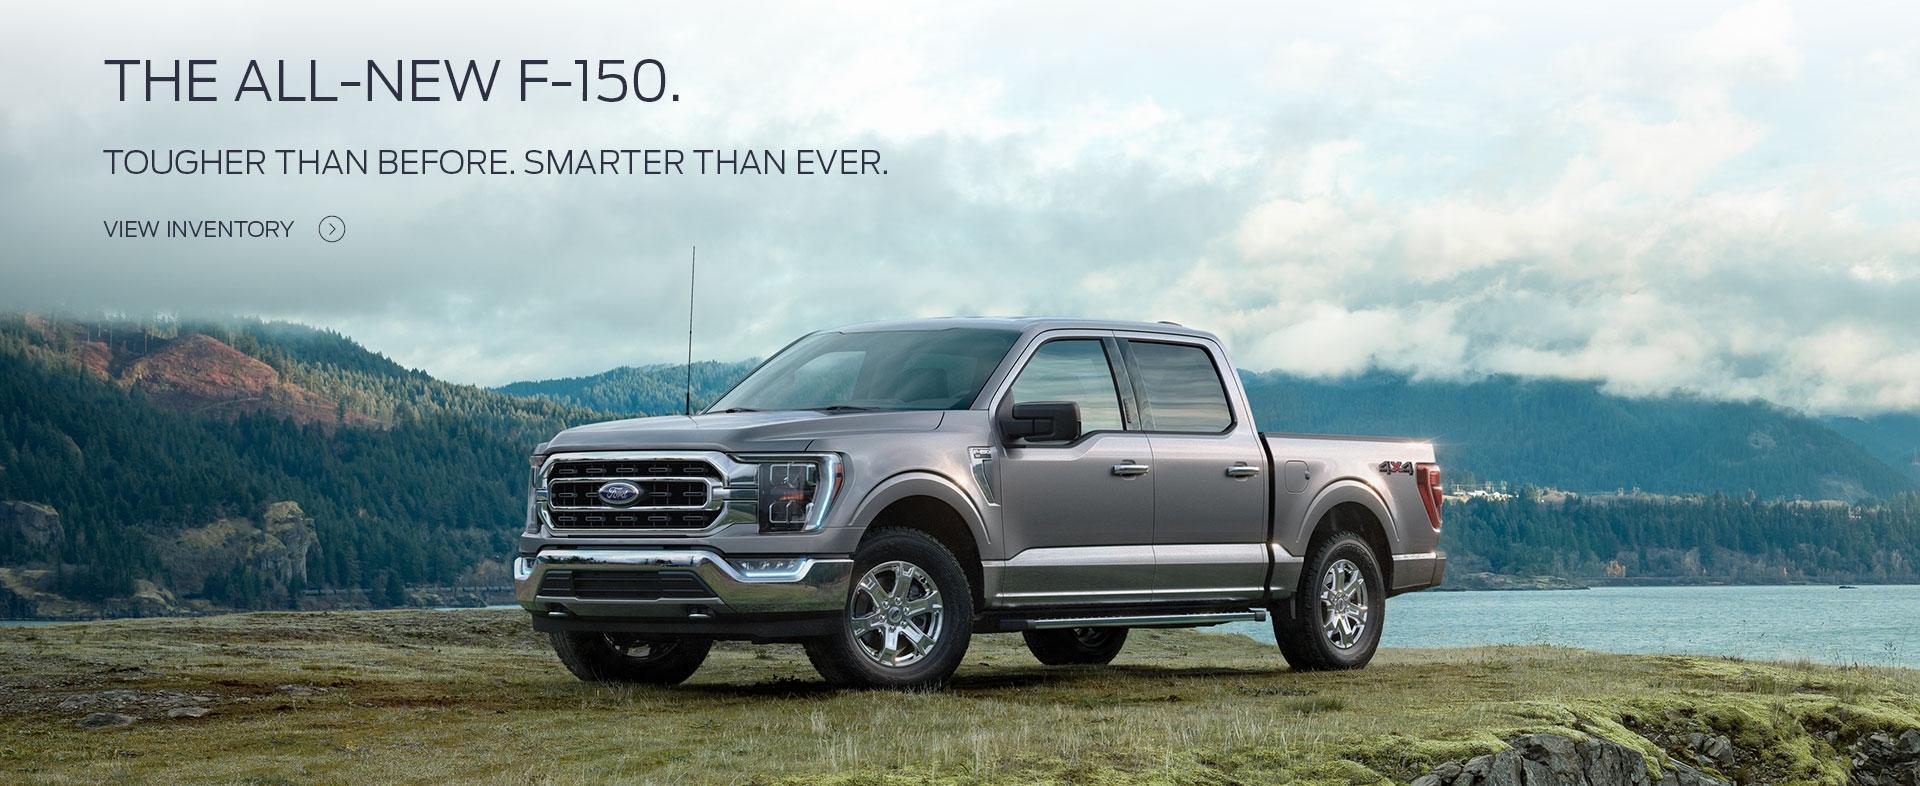 2021 Ford F-150 | McDonnell Motors